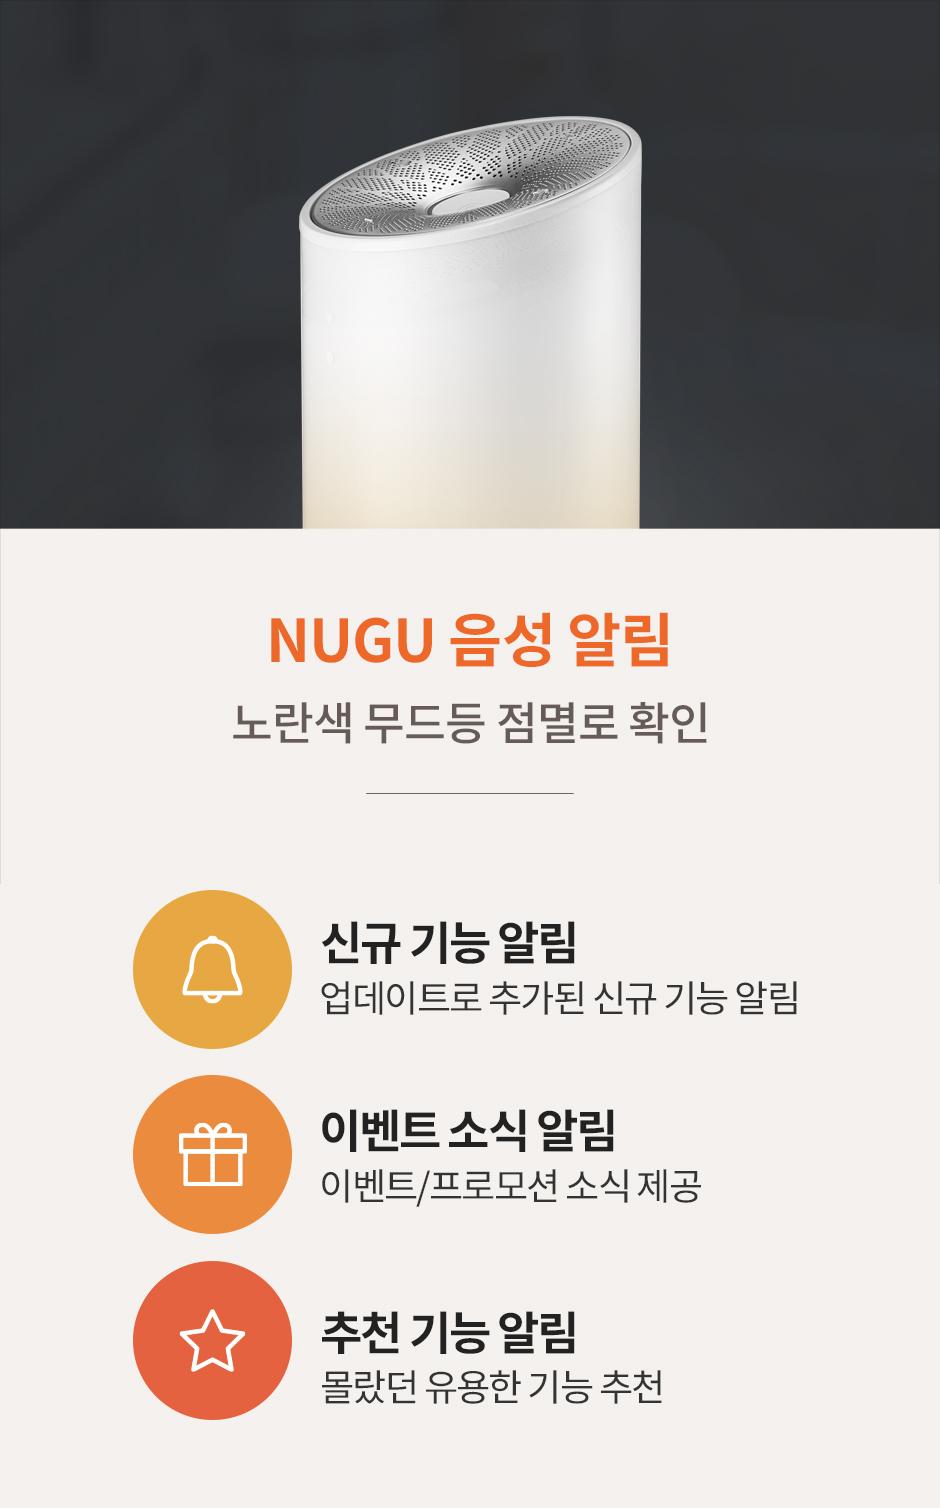 170413-nugu-new-6